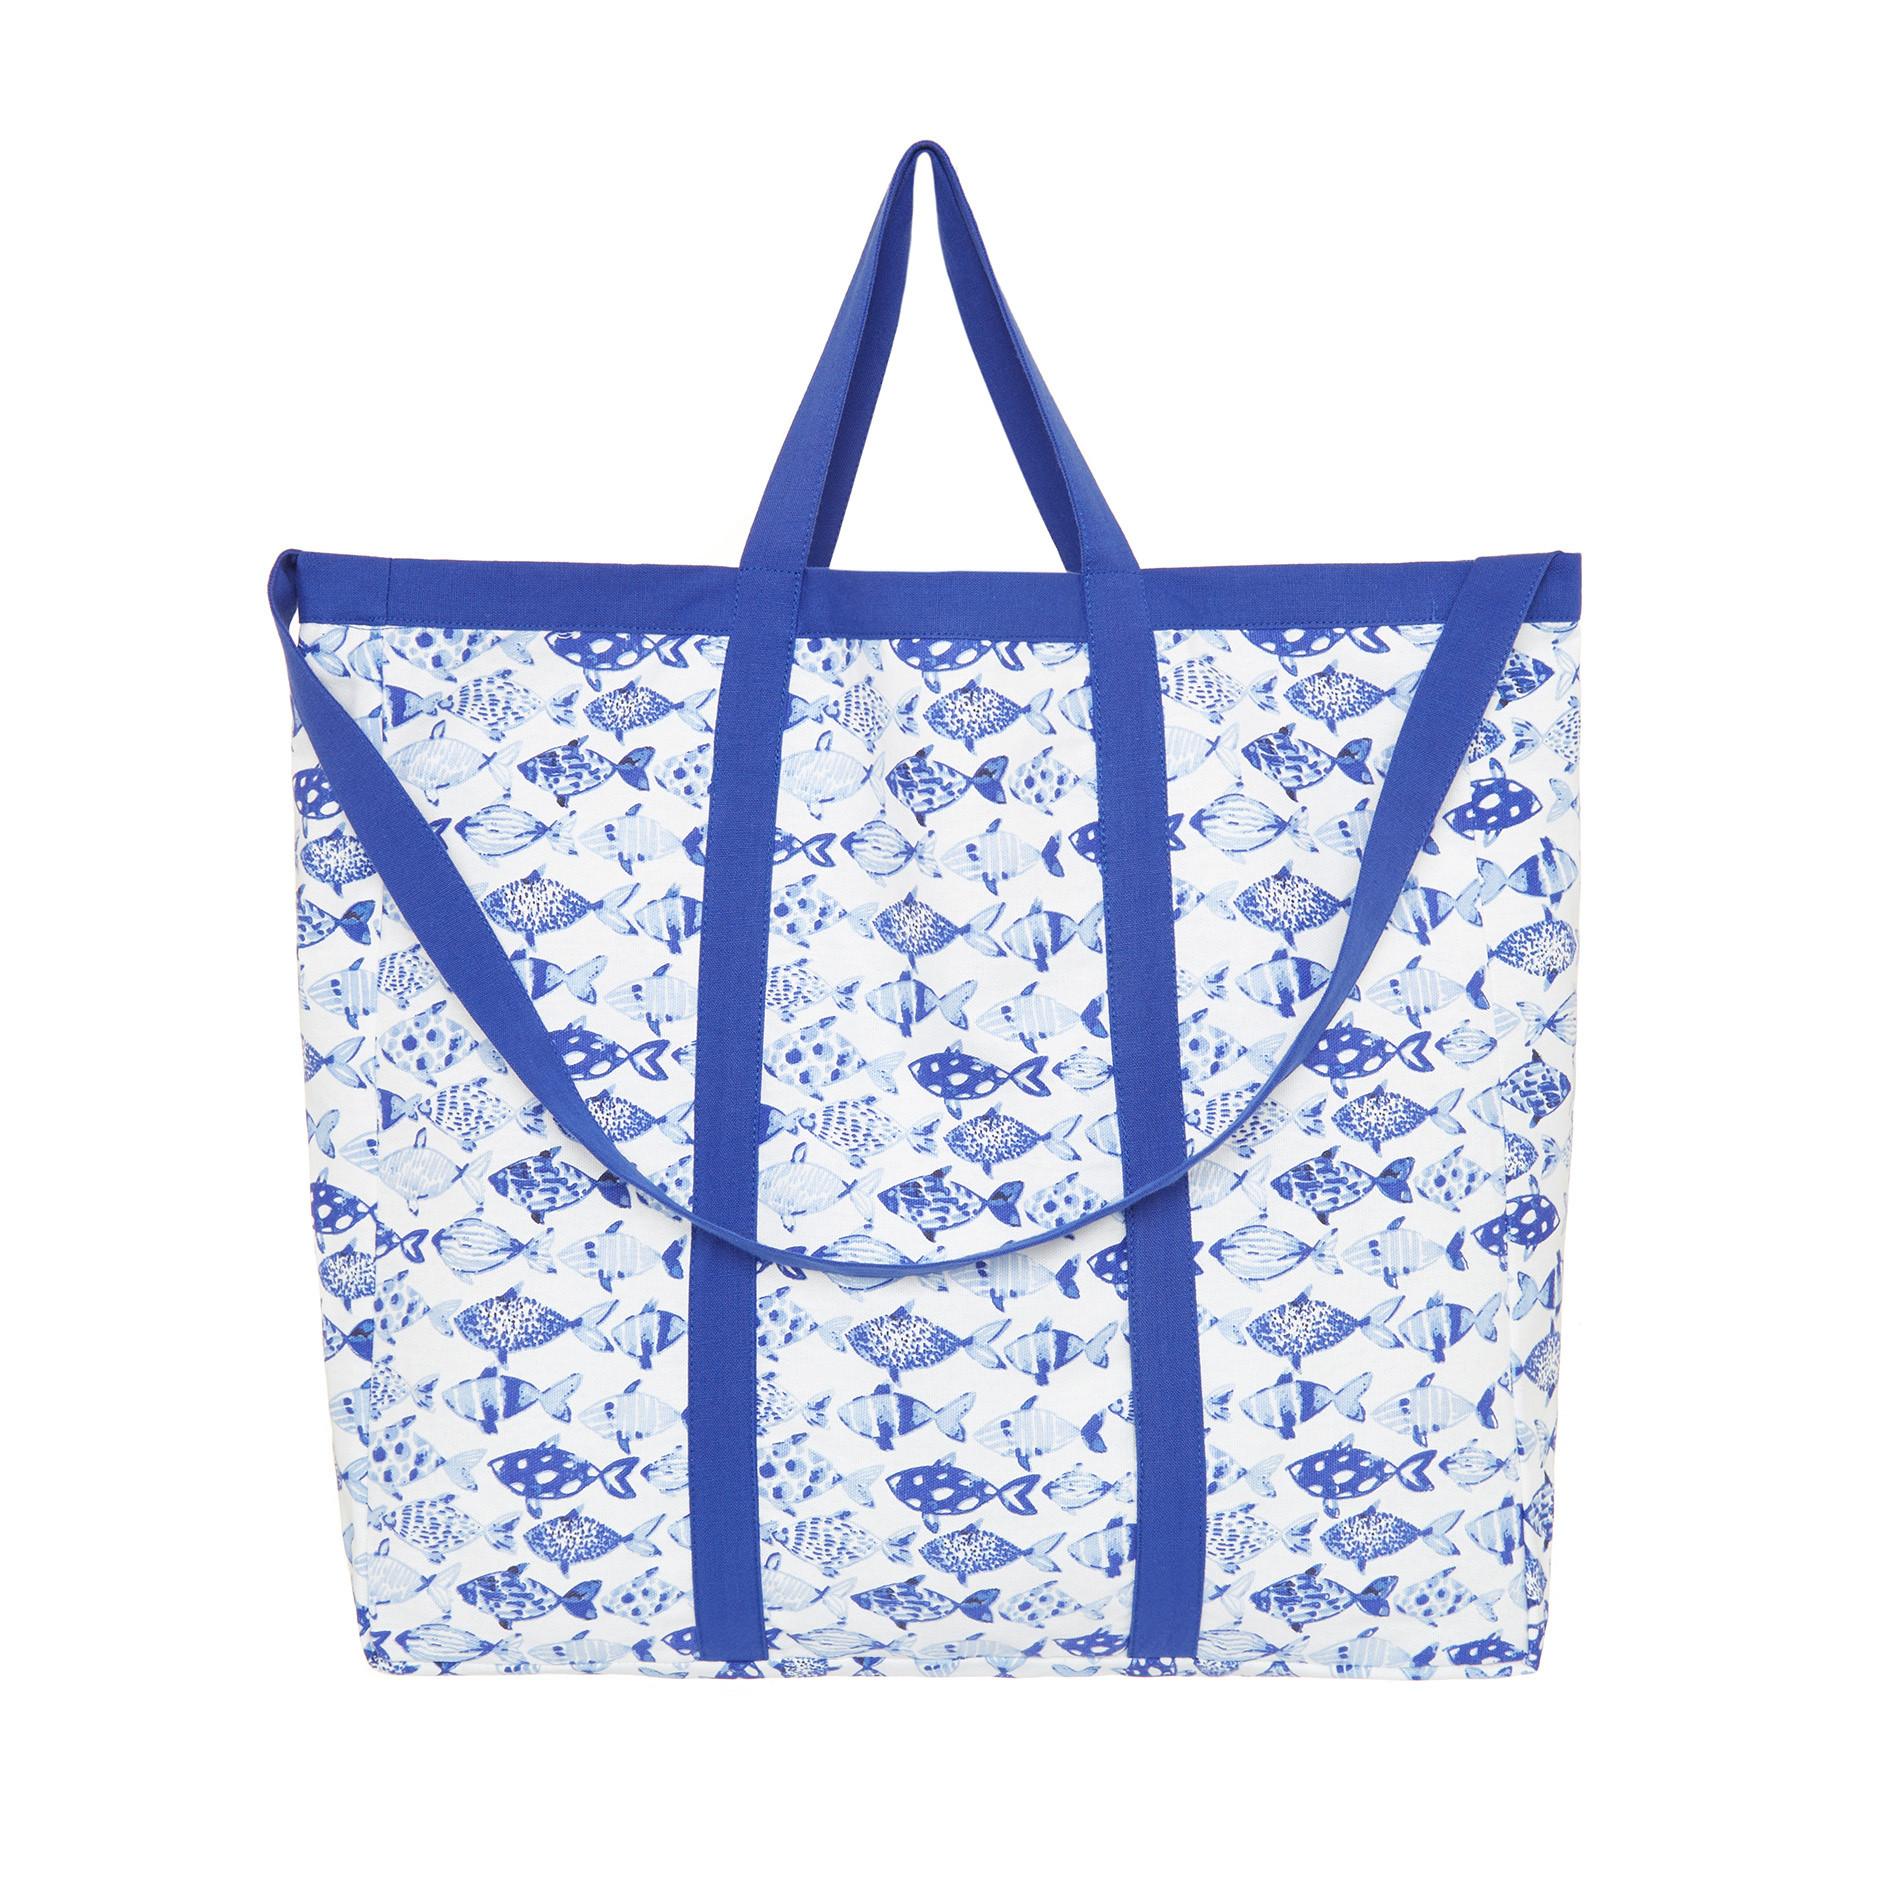 Borsa puro cotone stampa pesci, Azzurro, large image number 0